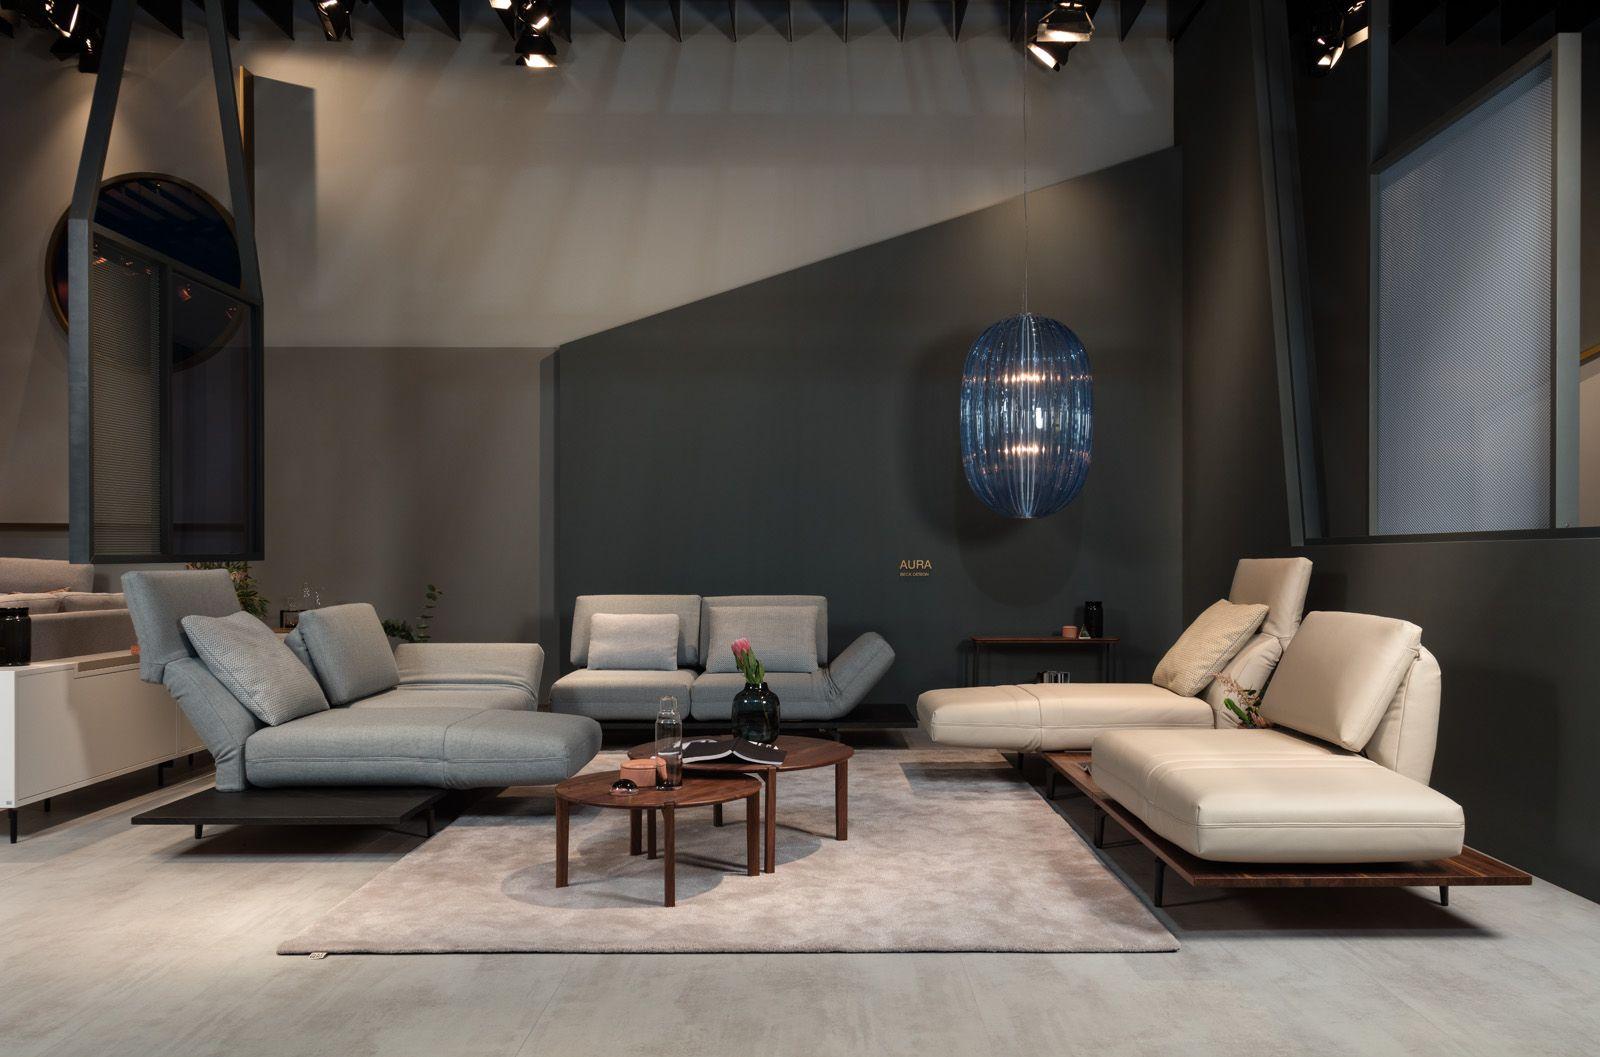 Olf Benz Aura Authentic Elegance For The Living Room Rolfbenz Luxurysofa Designersofa Luxurylivingroom Modern Luxury Living Room Luxury Sofa Sofa Design